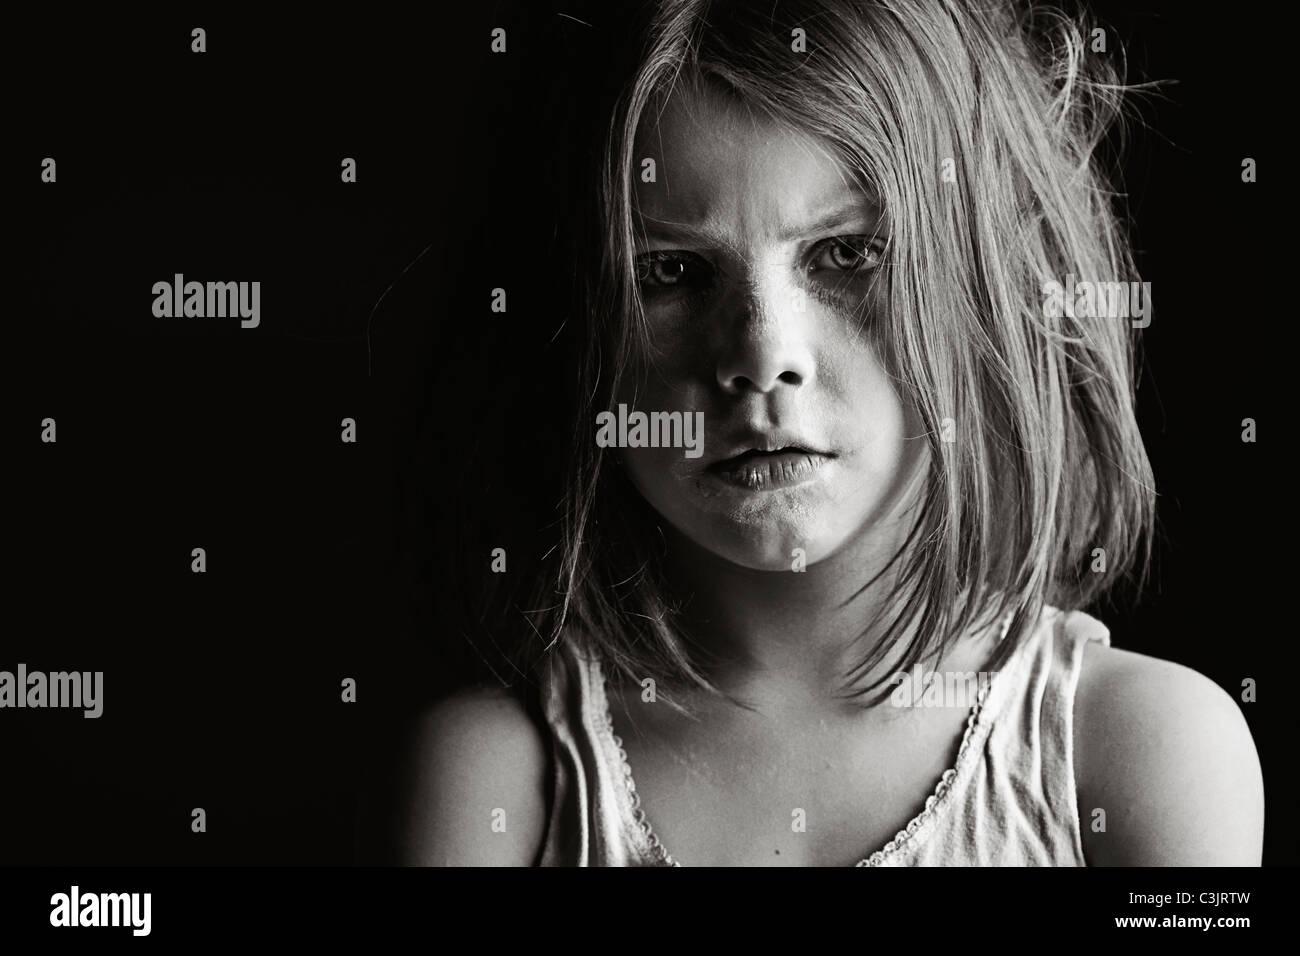 Studio portrait of serious girl (6-7) - Stock Image